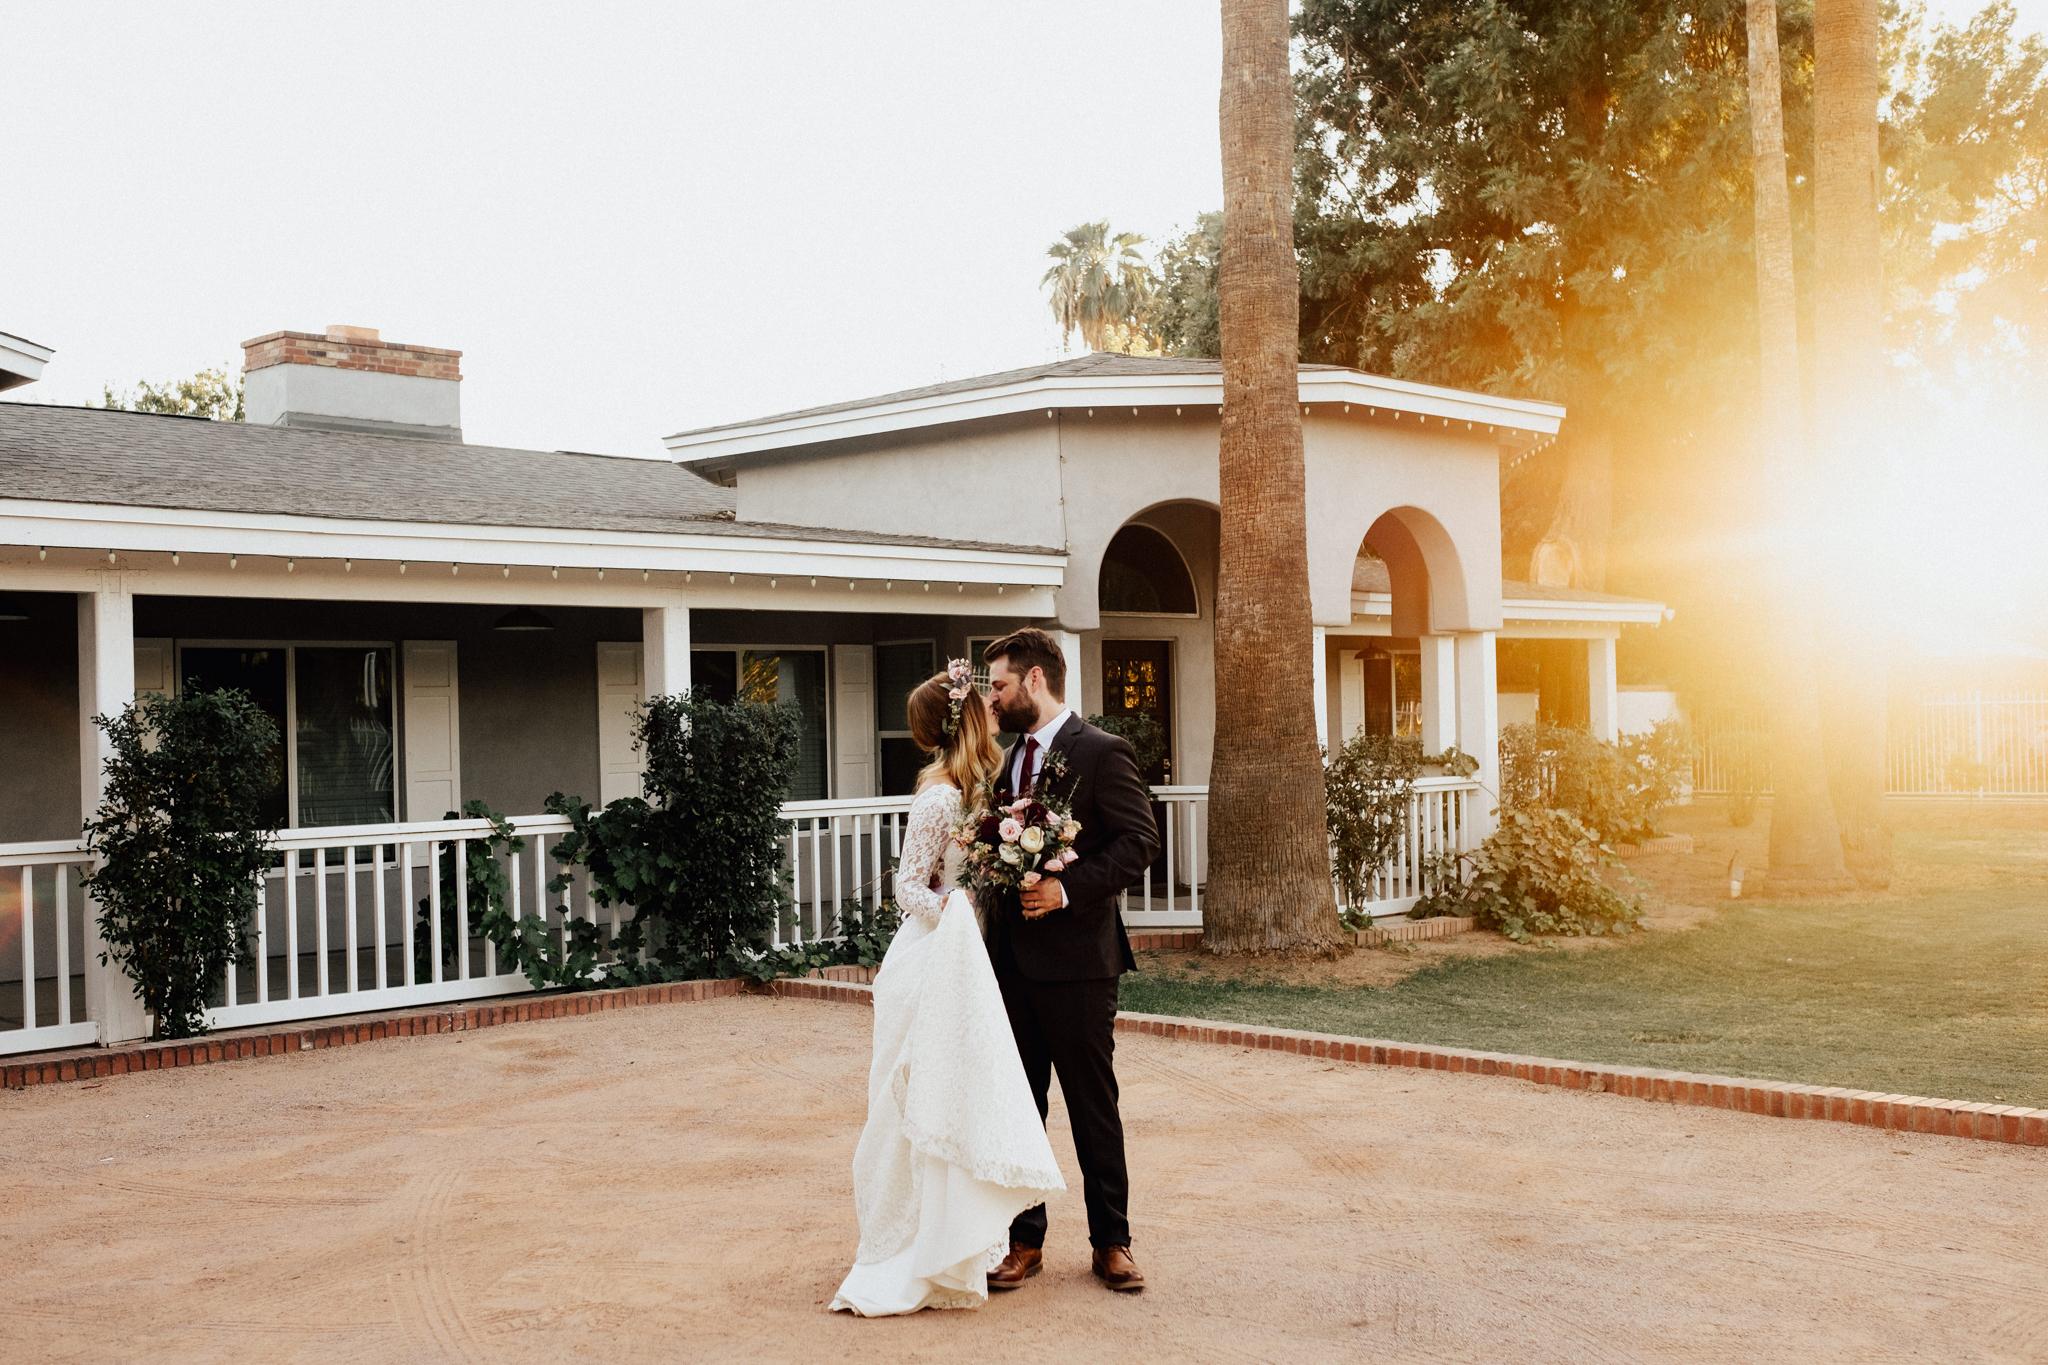 Arizona-Adventure-Elopement-Wedding-Photographer-132.jpg